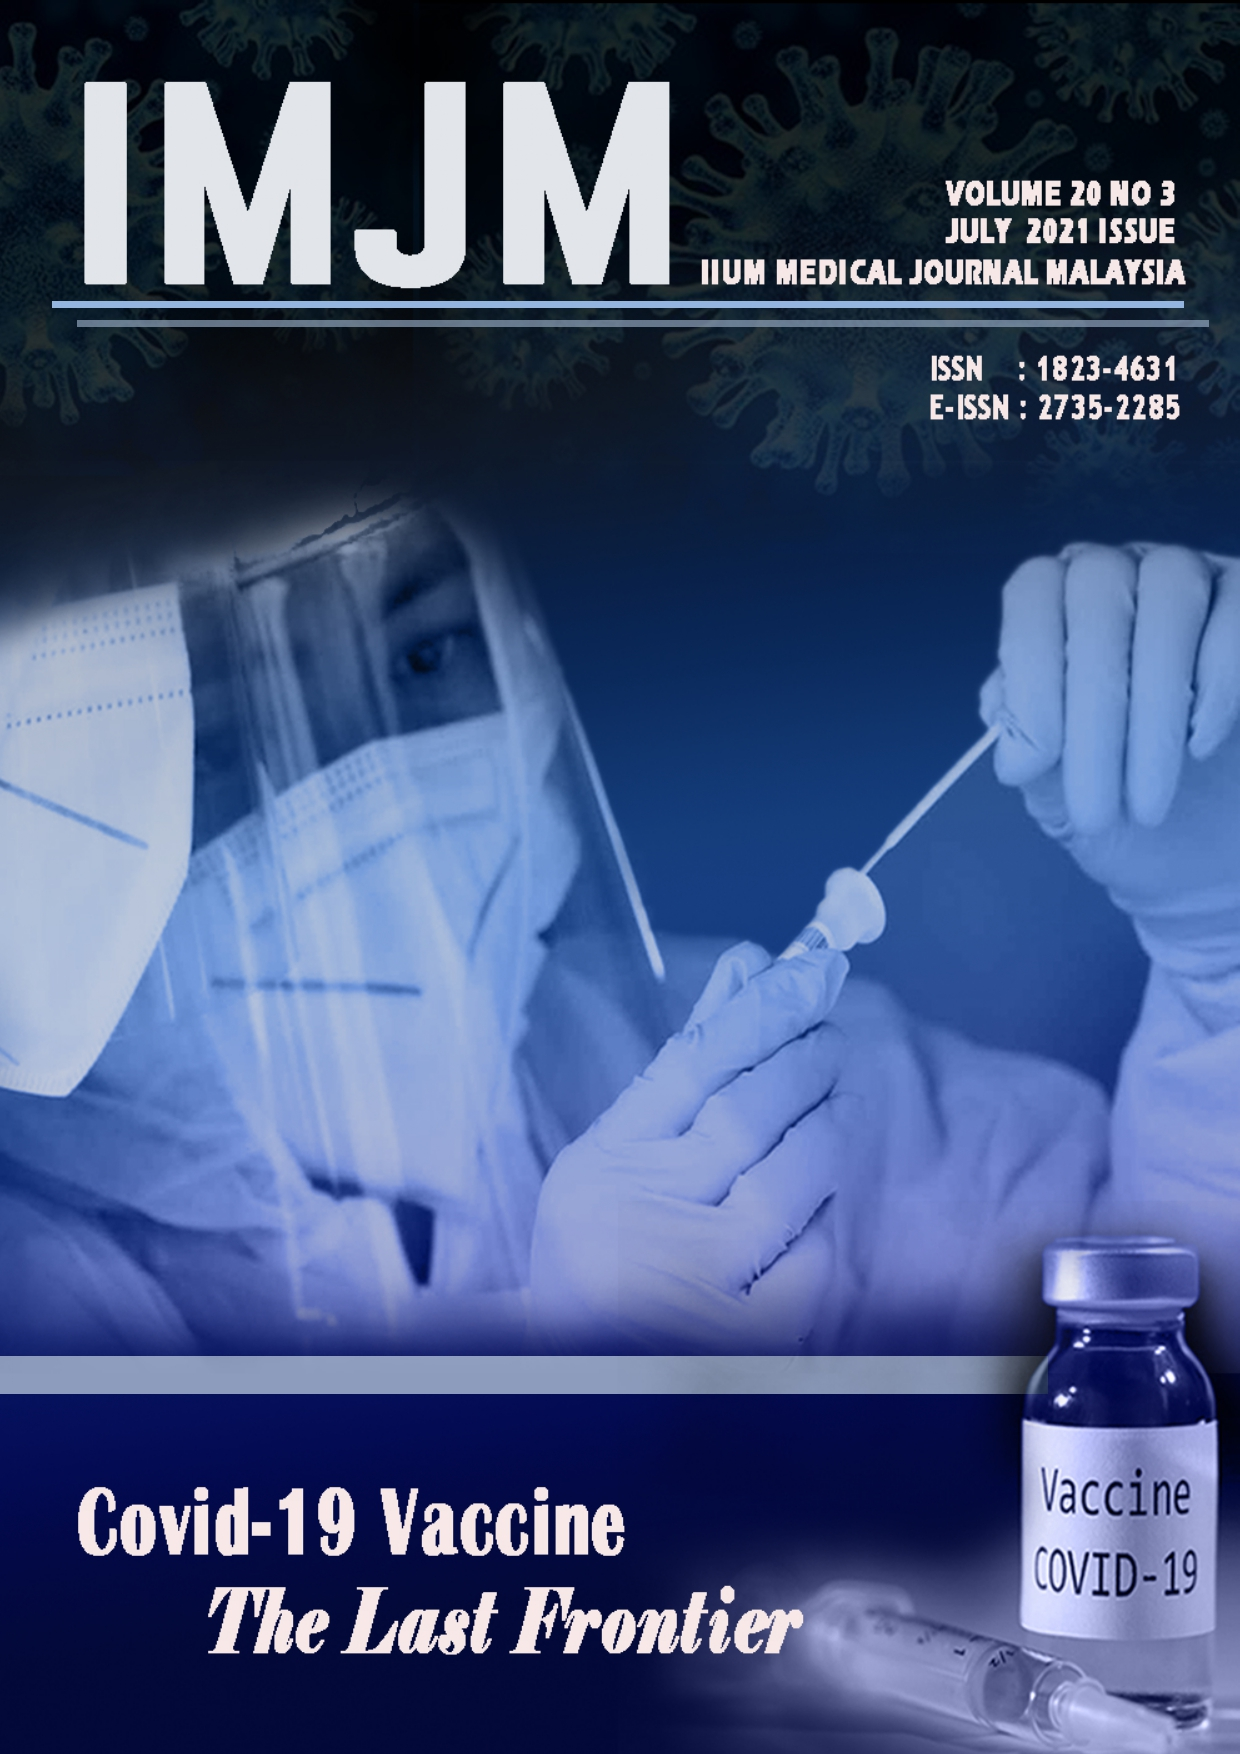 View Vol. 20 No. 3 (2021): IIUM Medical Journal Malaysia - July 2021